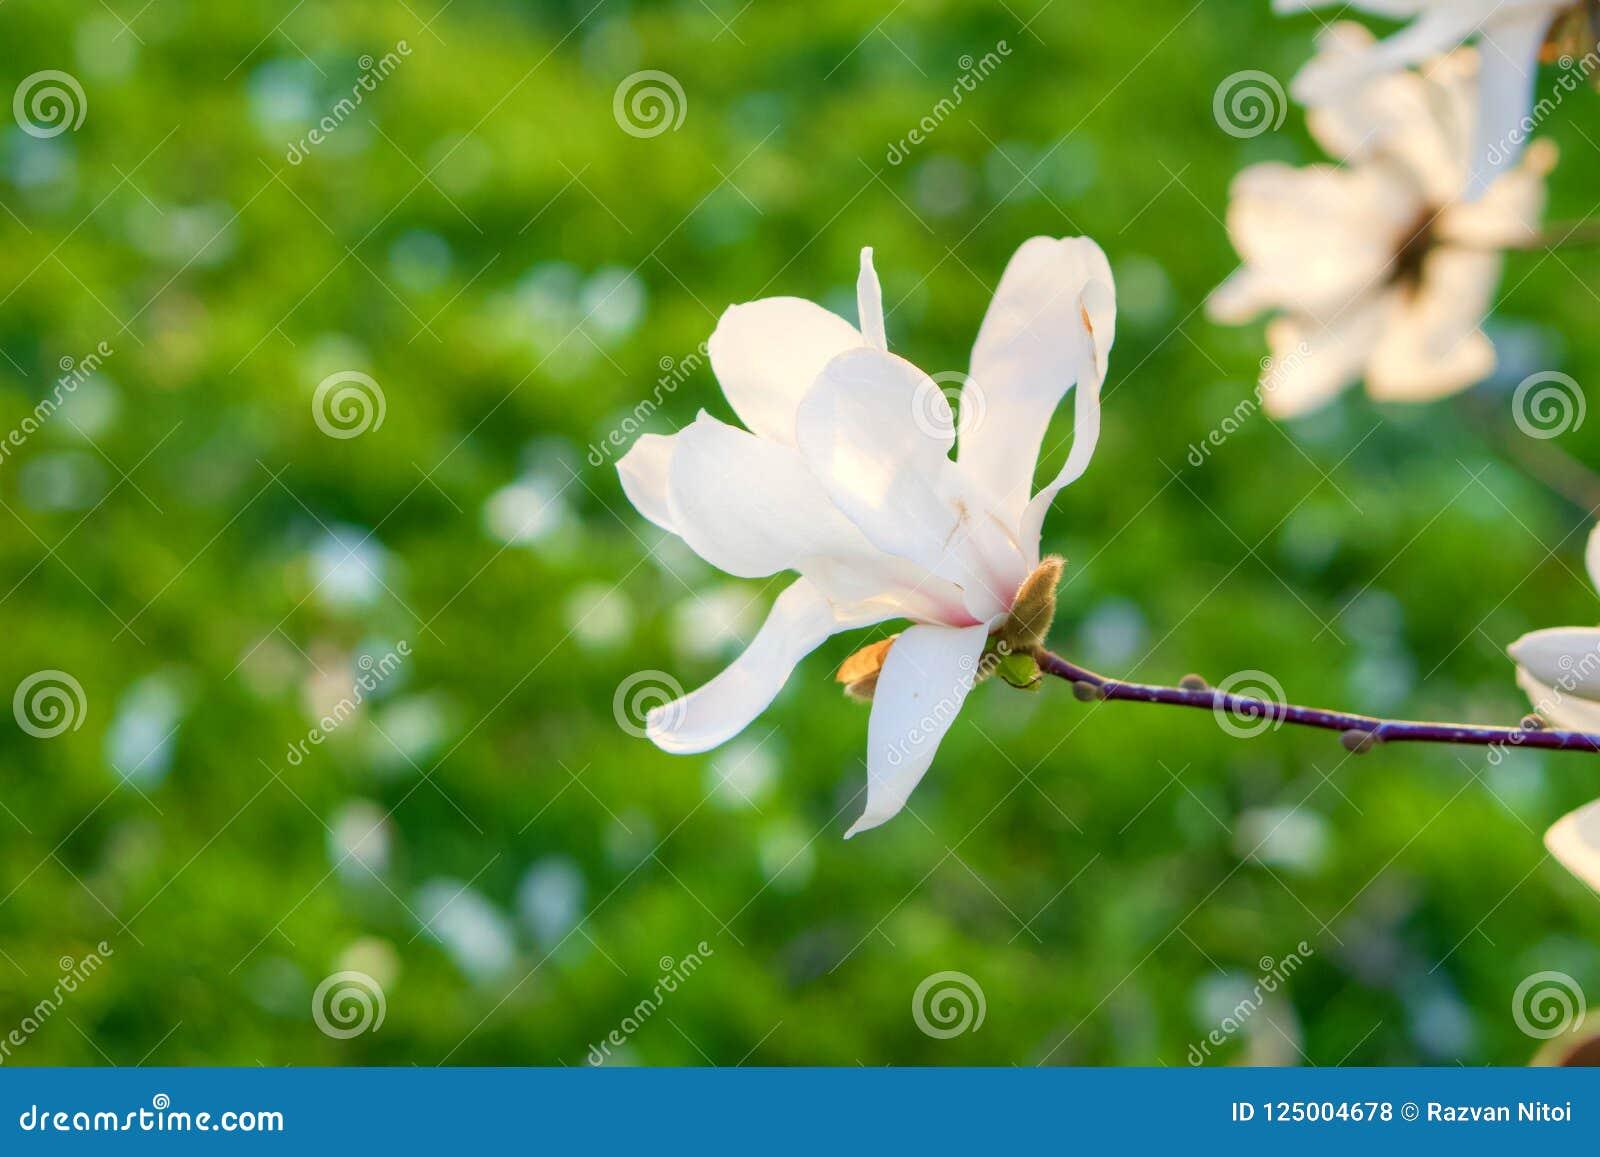 Delicate Magnolia Tree White Flowers In Springtime Stock Photo